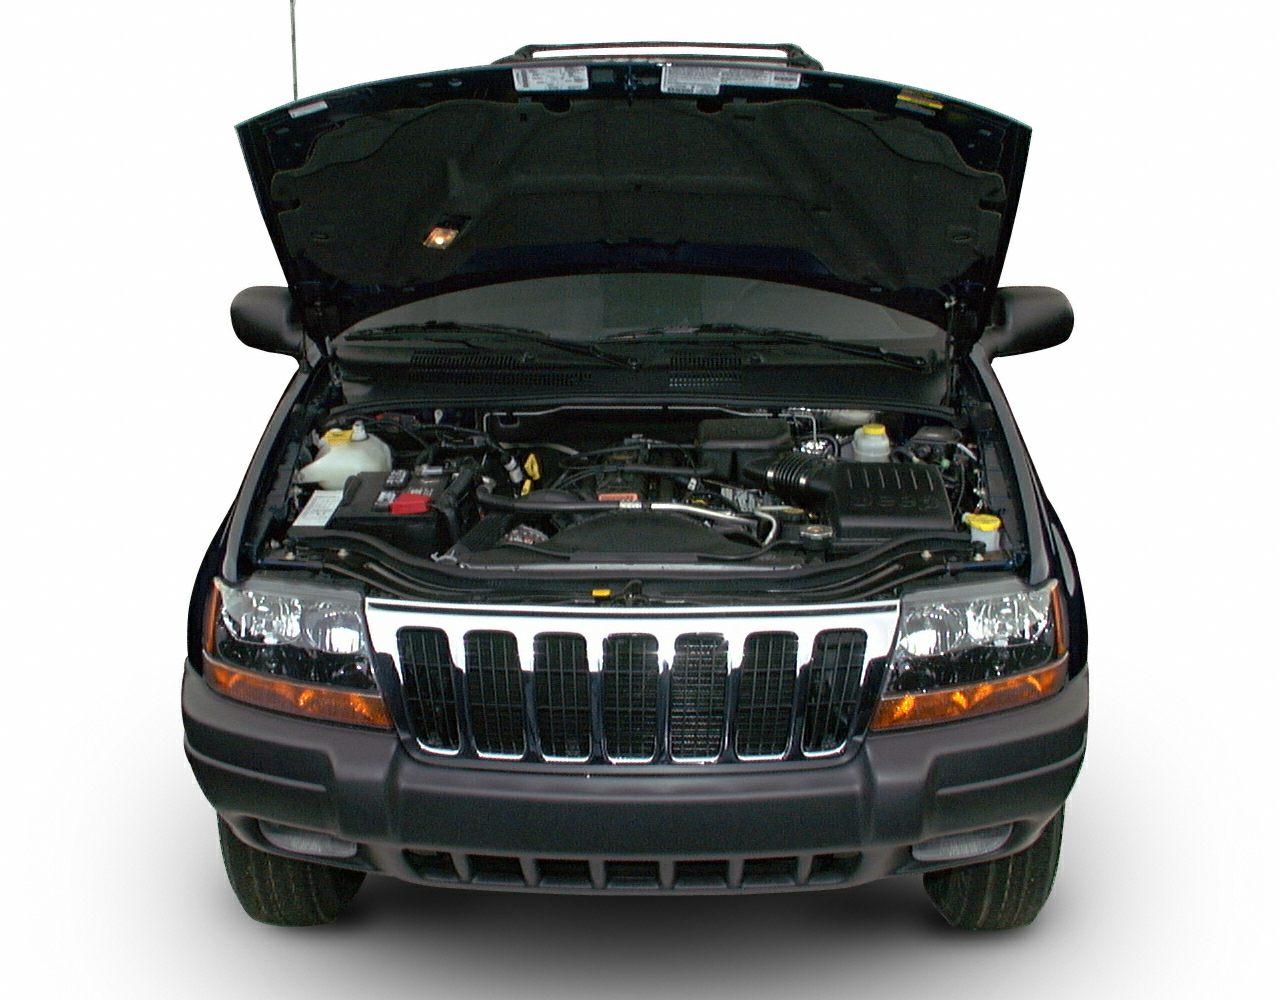 1999 Jeep Grand Cherokee Laredo >> 2000 Jeep Grand Cherokee Laredo 4dr 4x4 Pictures